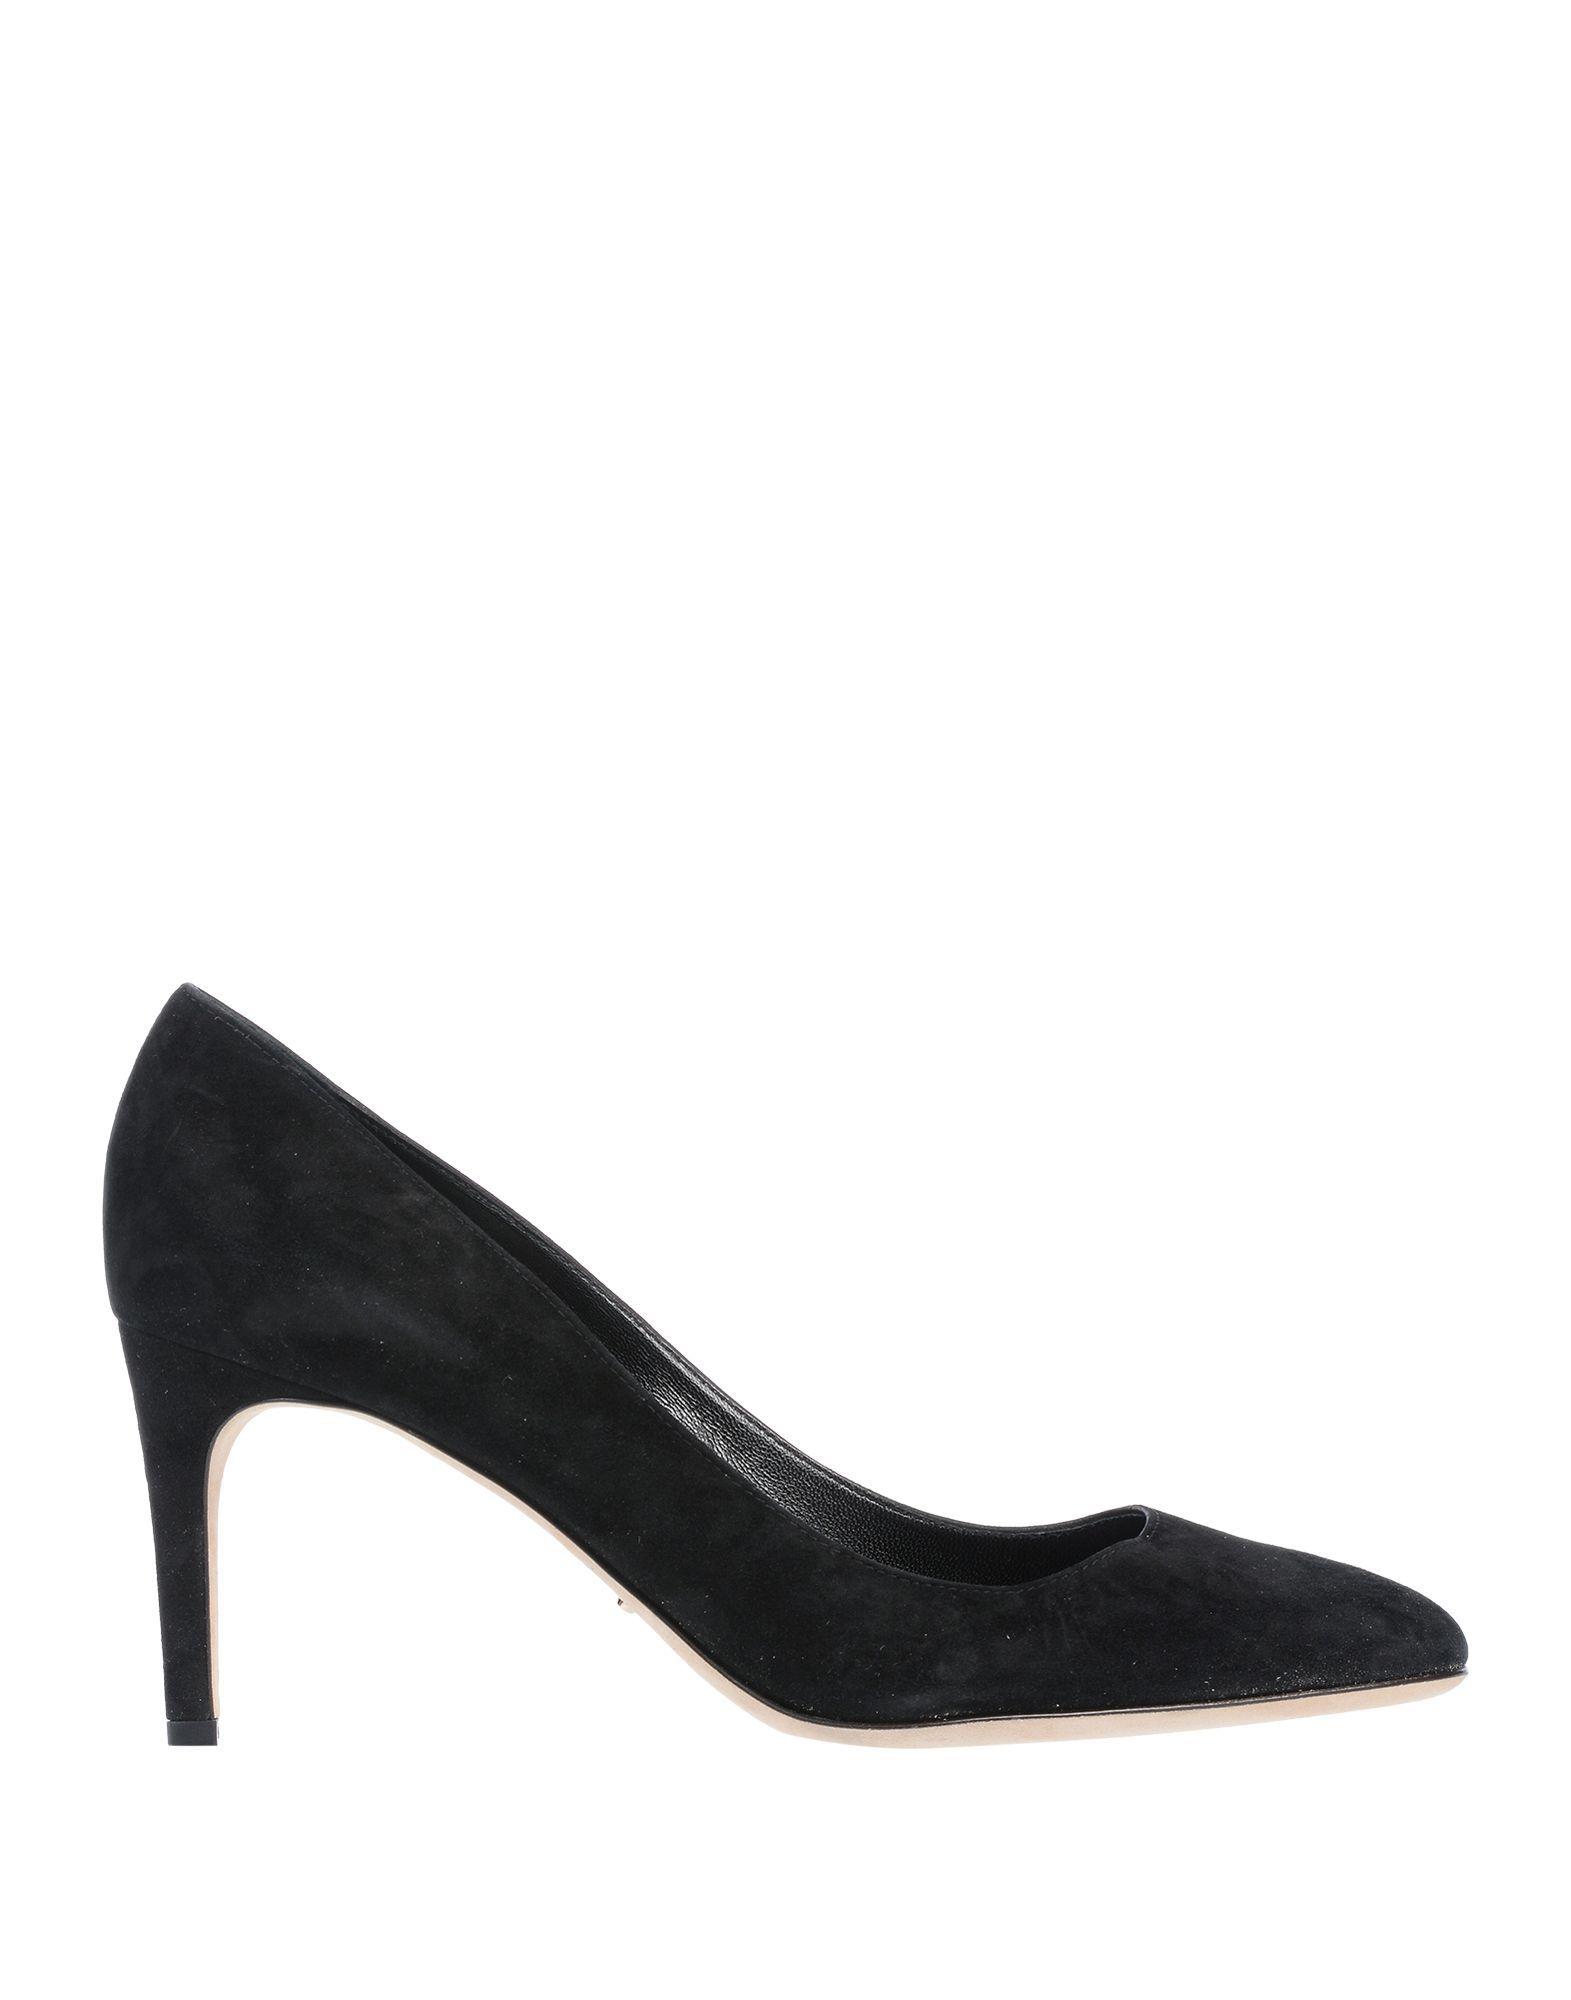 Sergio Rossi Black Leather Court Shoe Heels